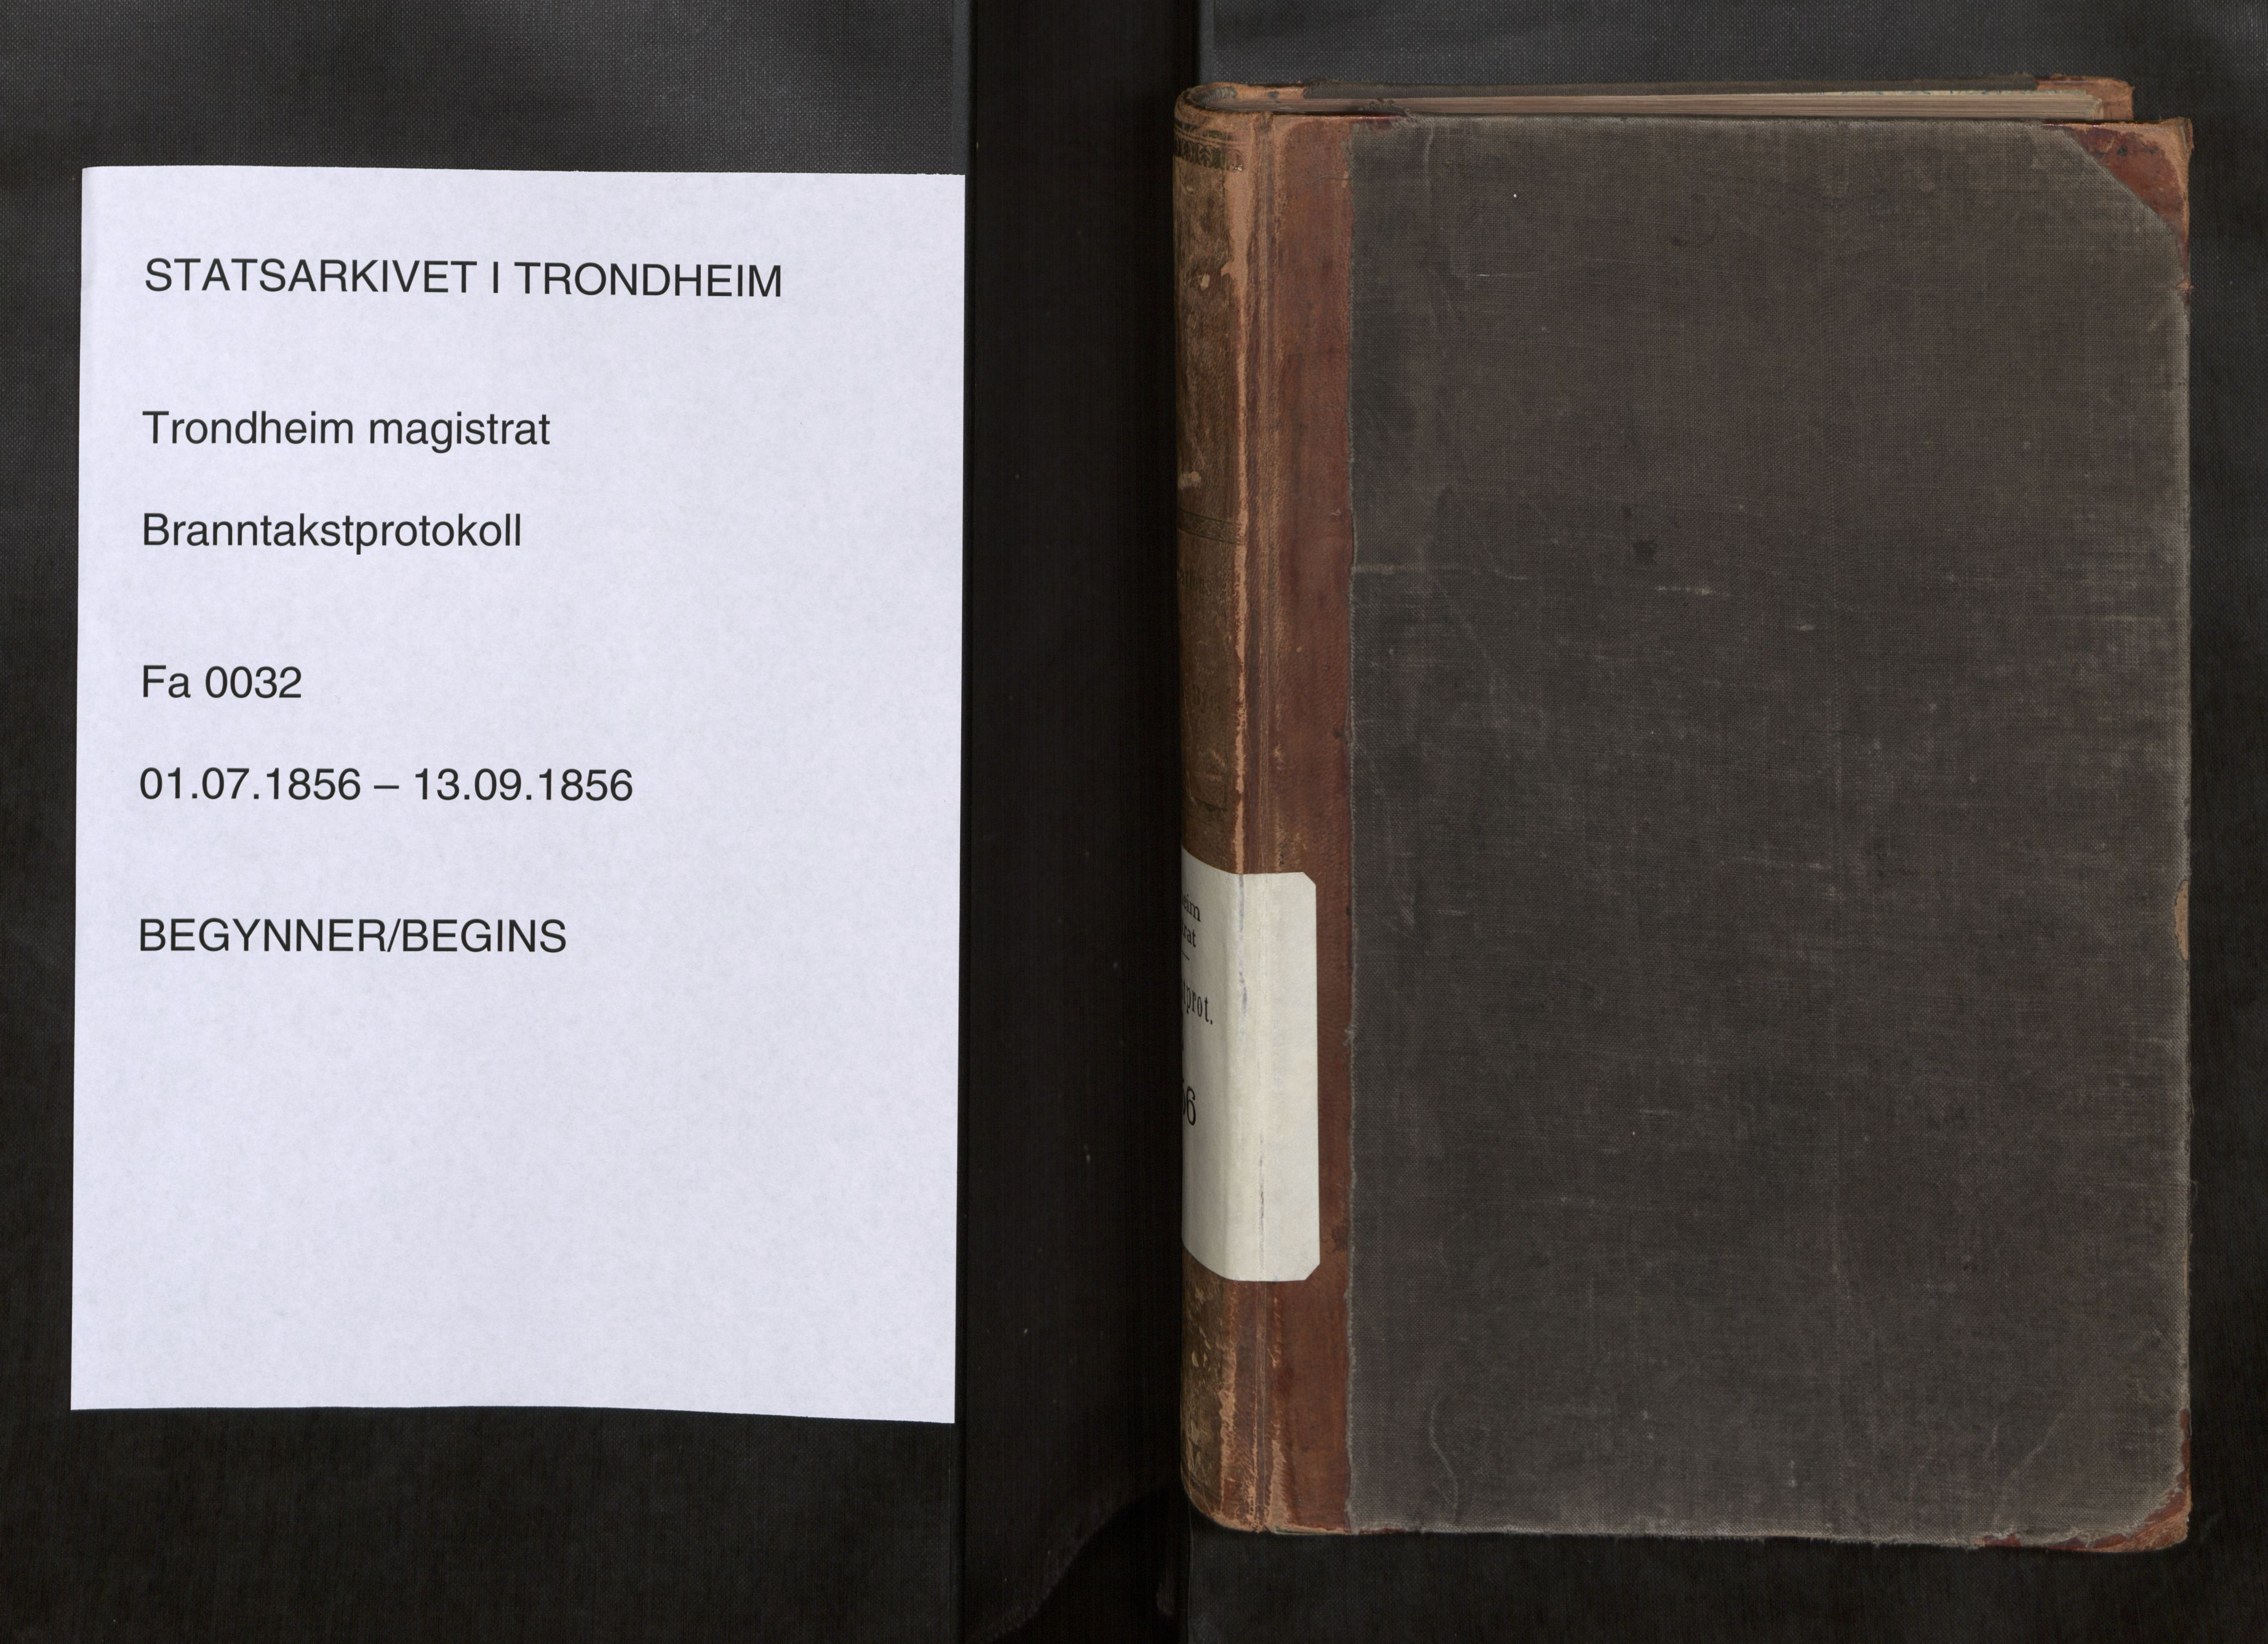 SAT, Norges Brannkasse Trondheim magistrat, Fa/L0035: Branntakstprotokoll E, 1856